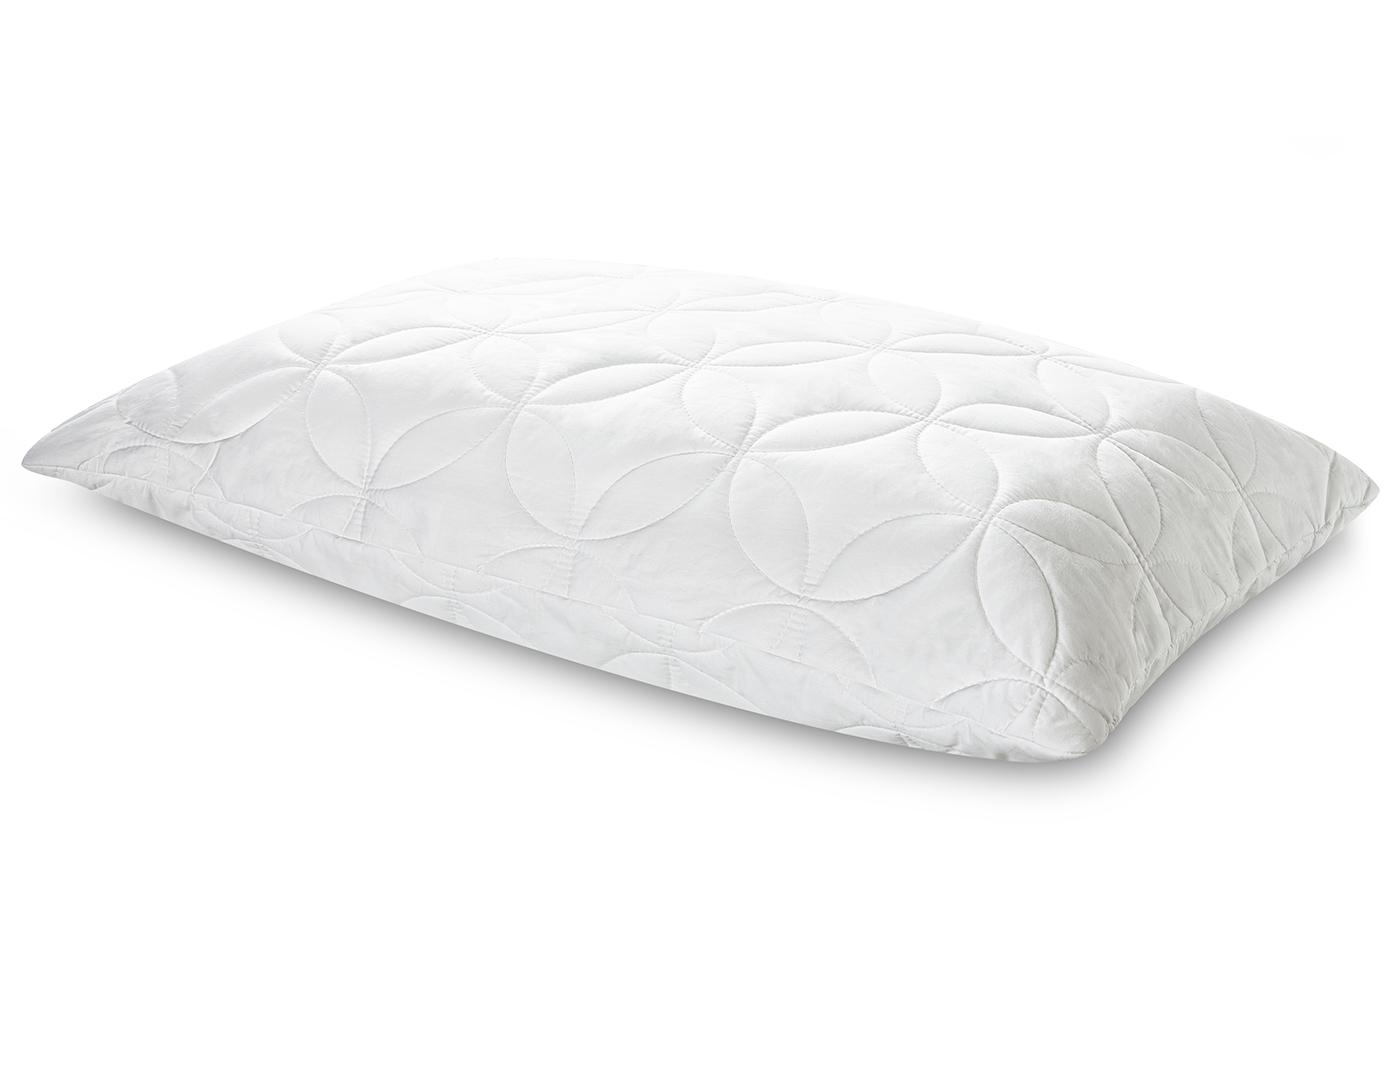 Tempur Cloud Soft Amp Conforming Queen Pillow Steinhafels